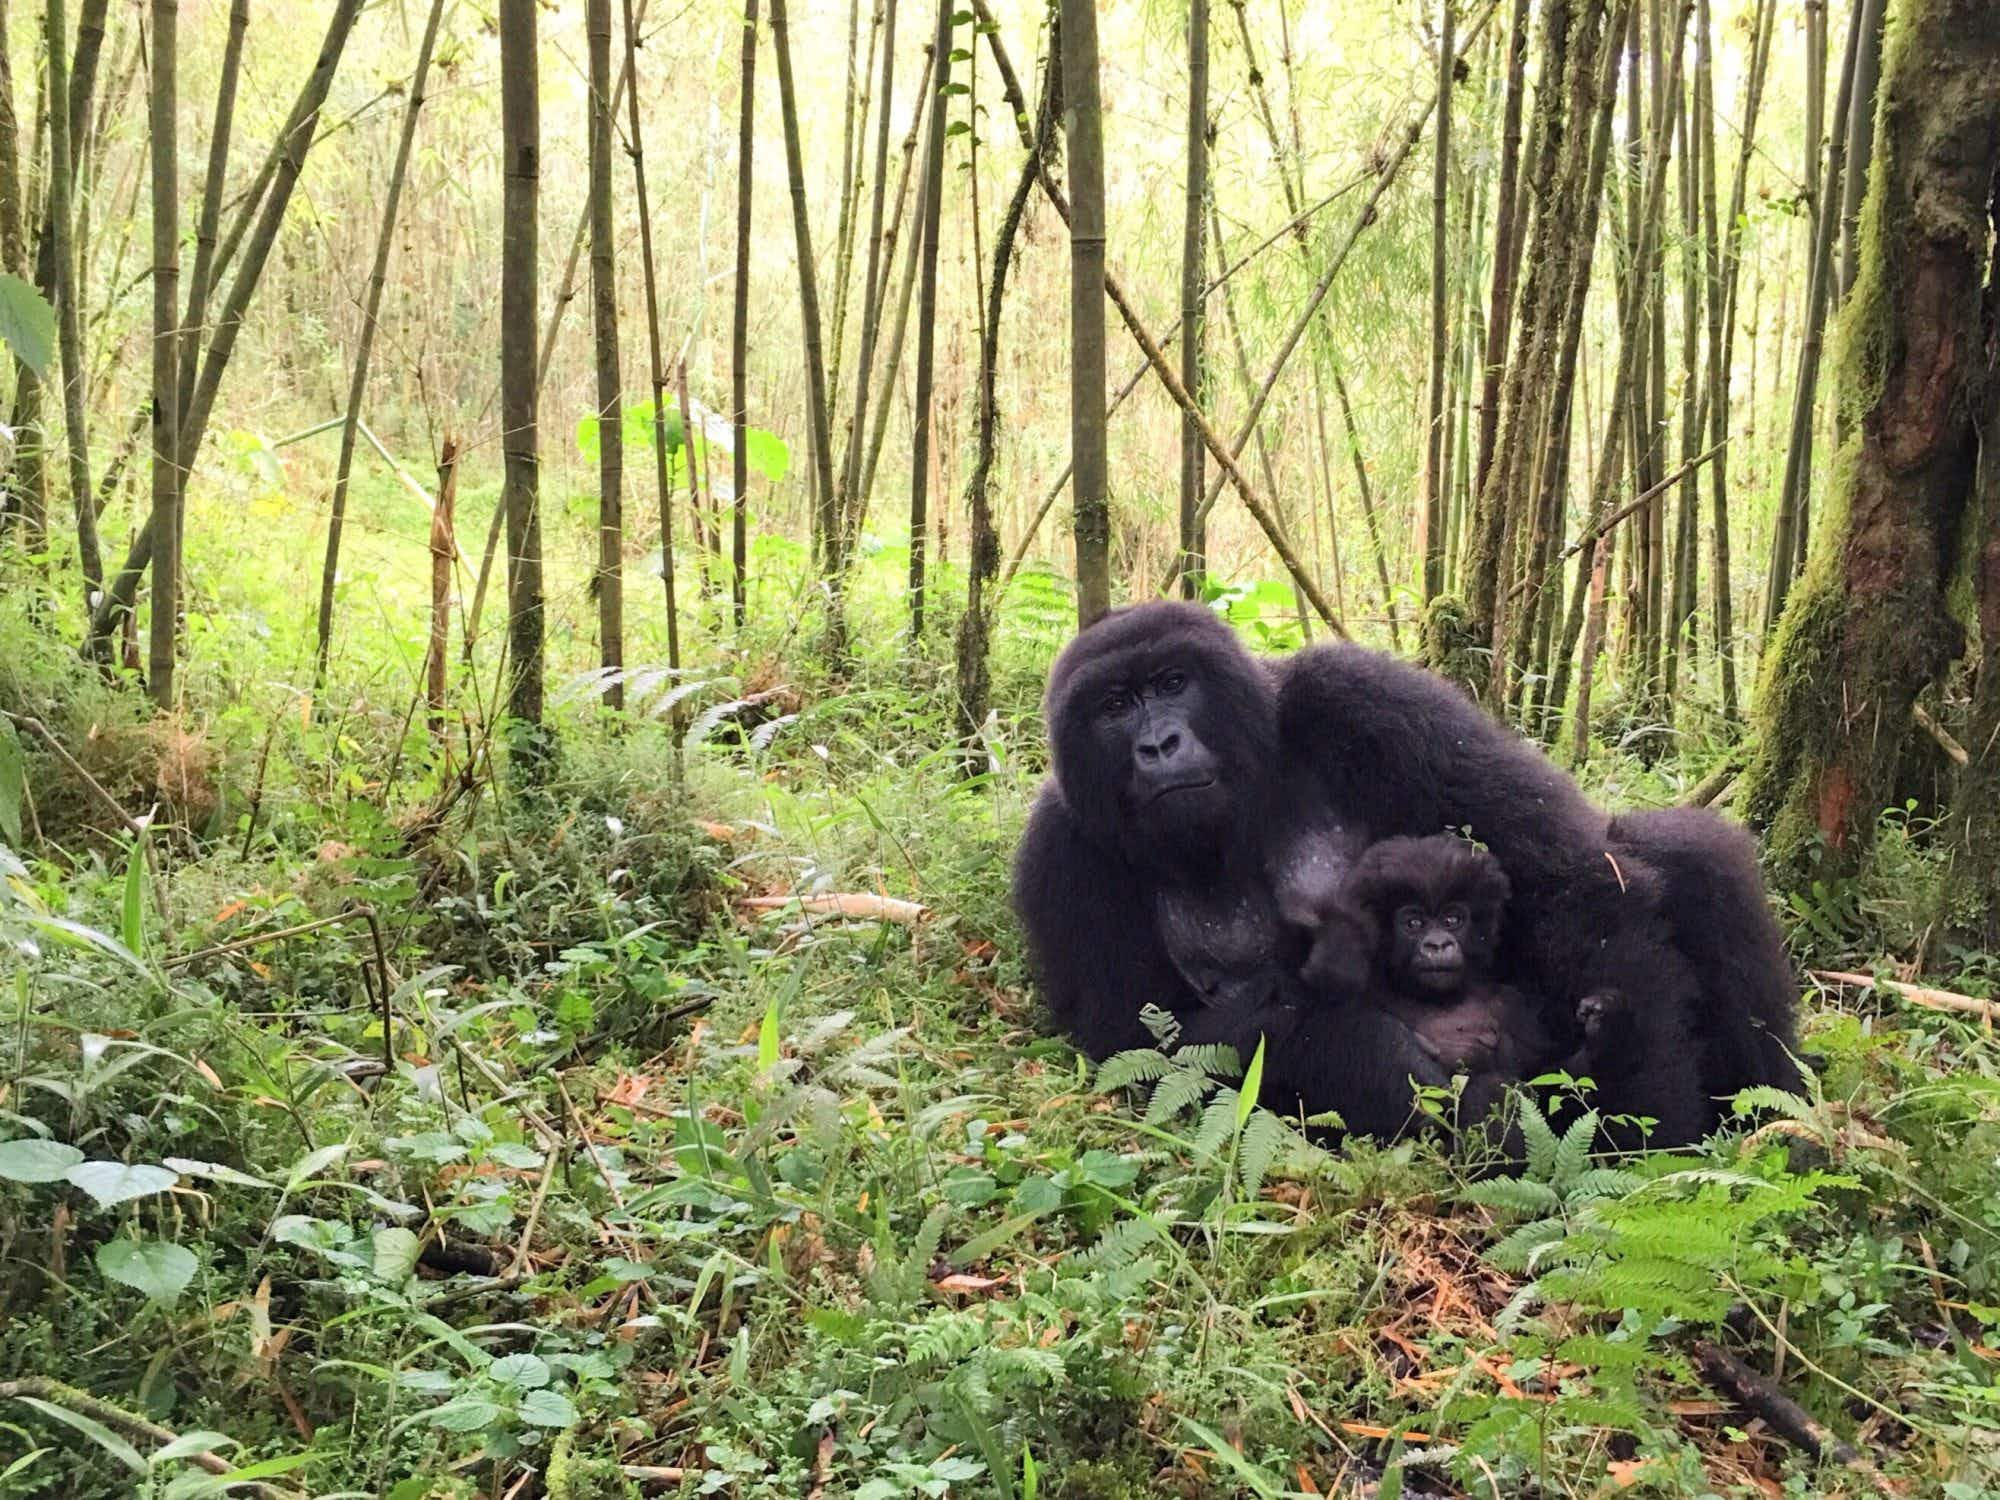 Gorilla habitat expanded in Rwanda's famed Volcanoes National Park